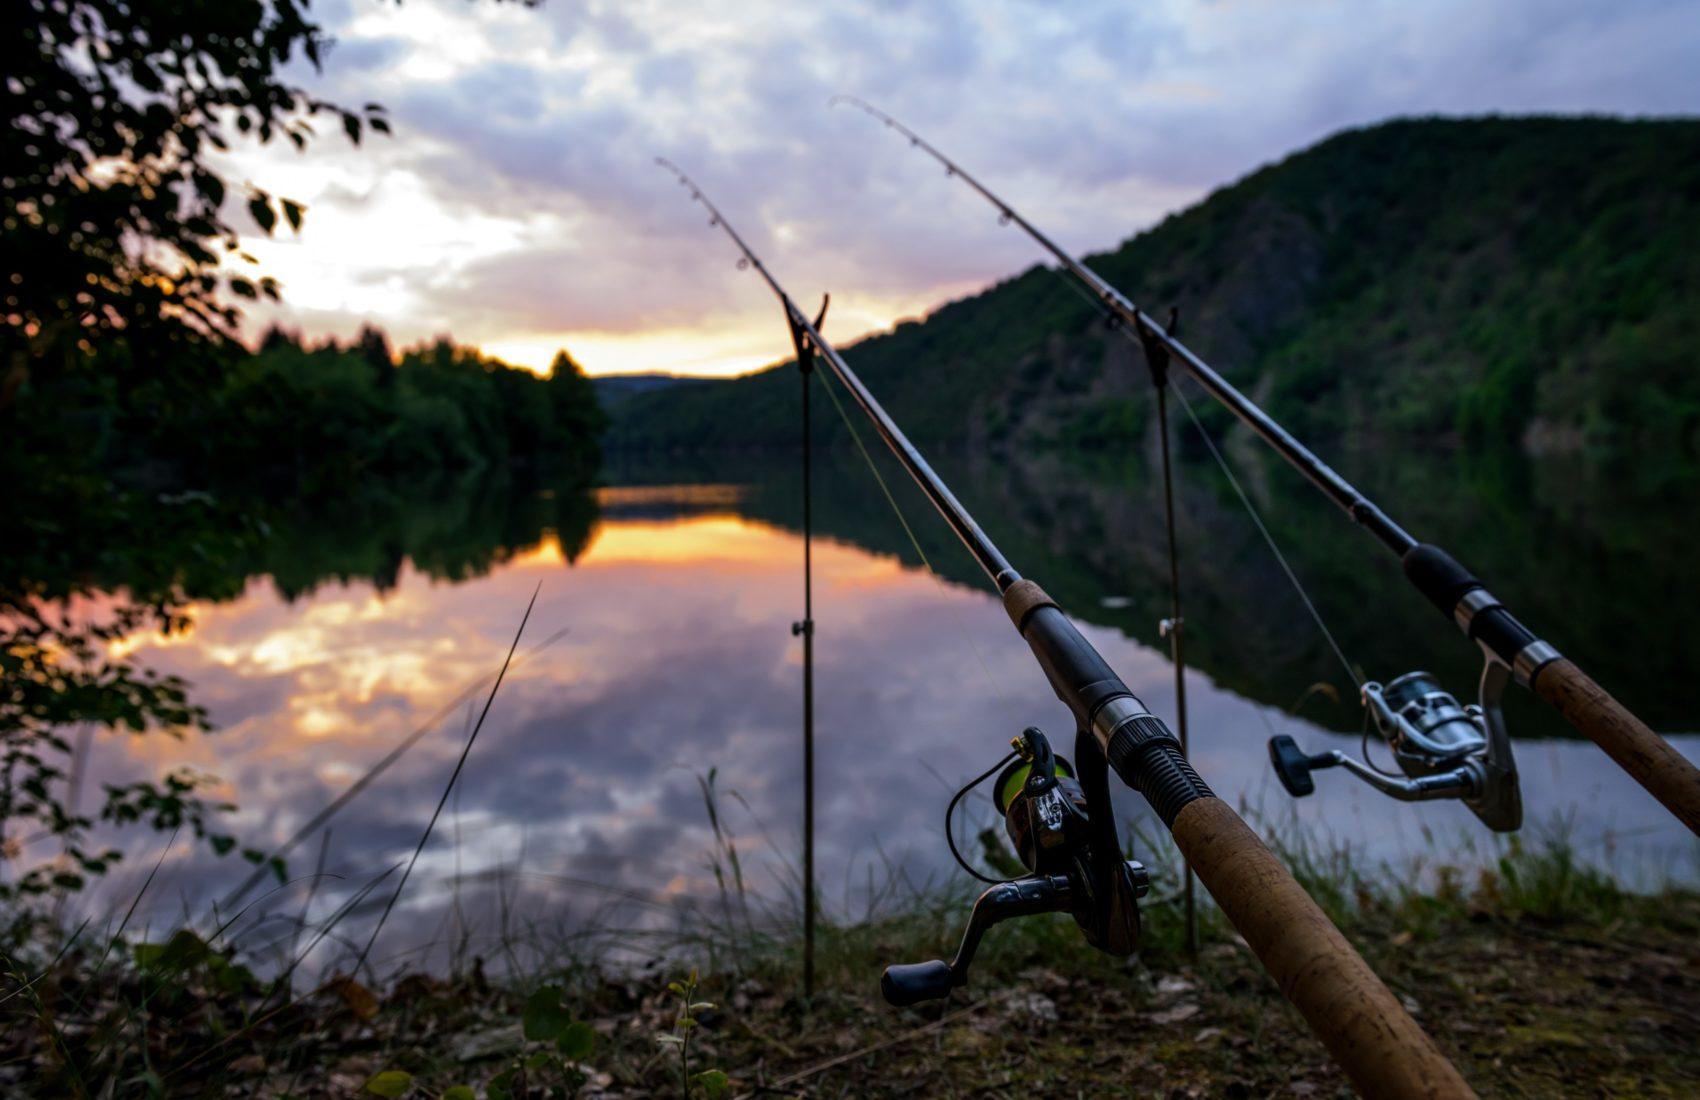 fishing-concepts-fishing-rods-river-morning-czech-republic